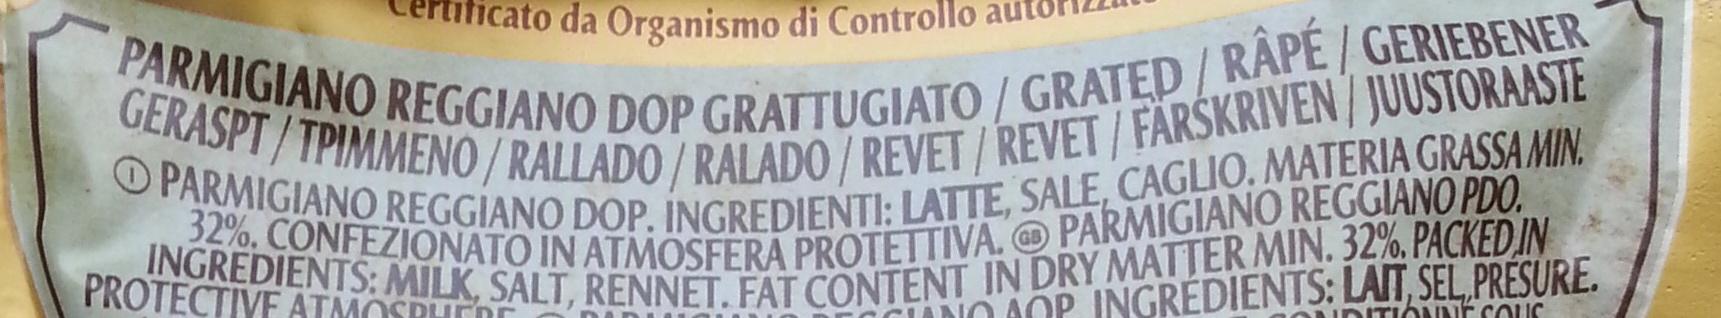 Parmareggio - Parmigiano reggiano DOP 30 mesi grattugiato - Ingredienti